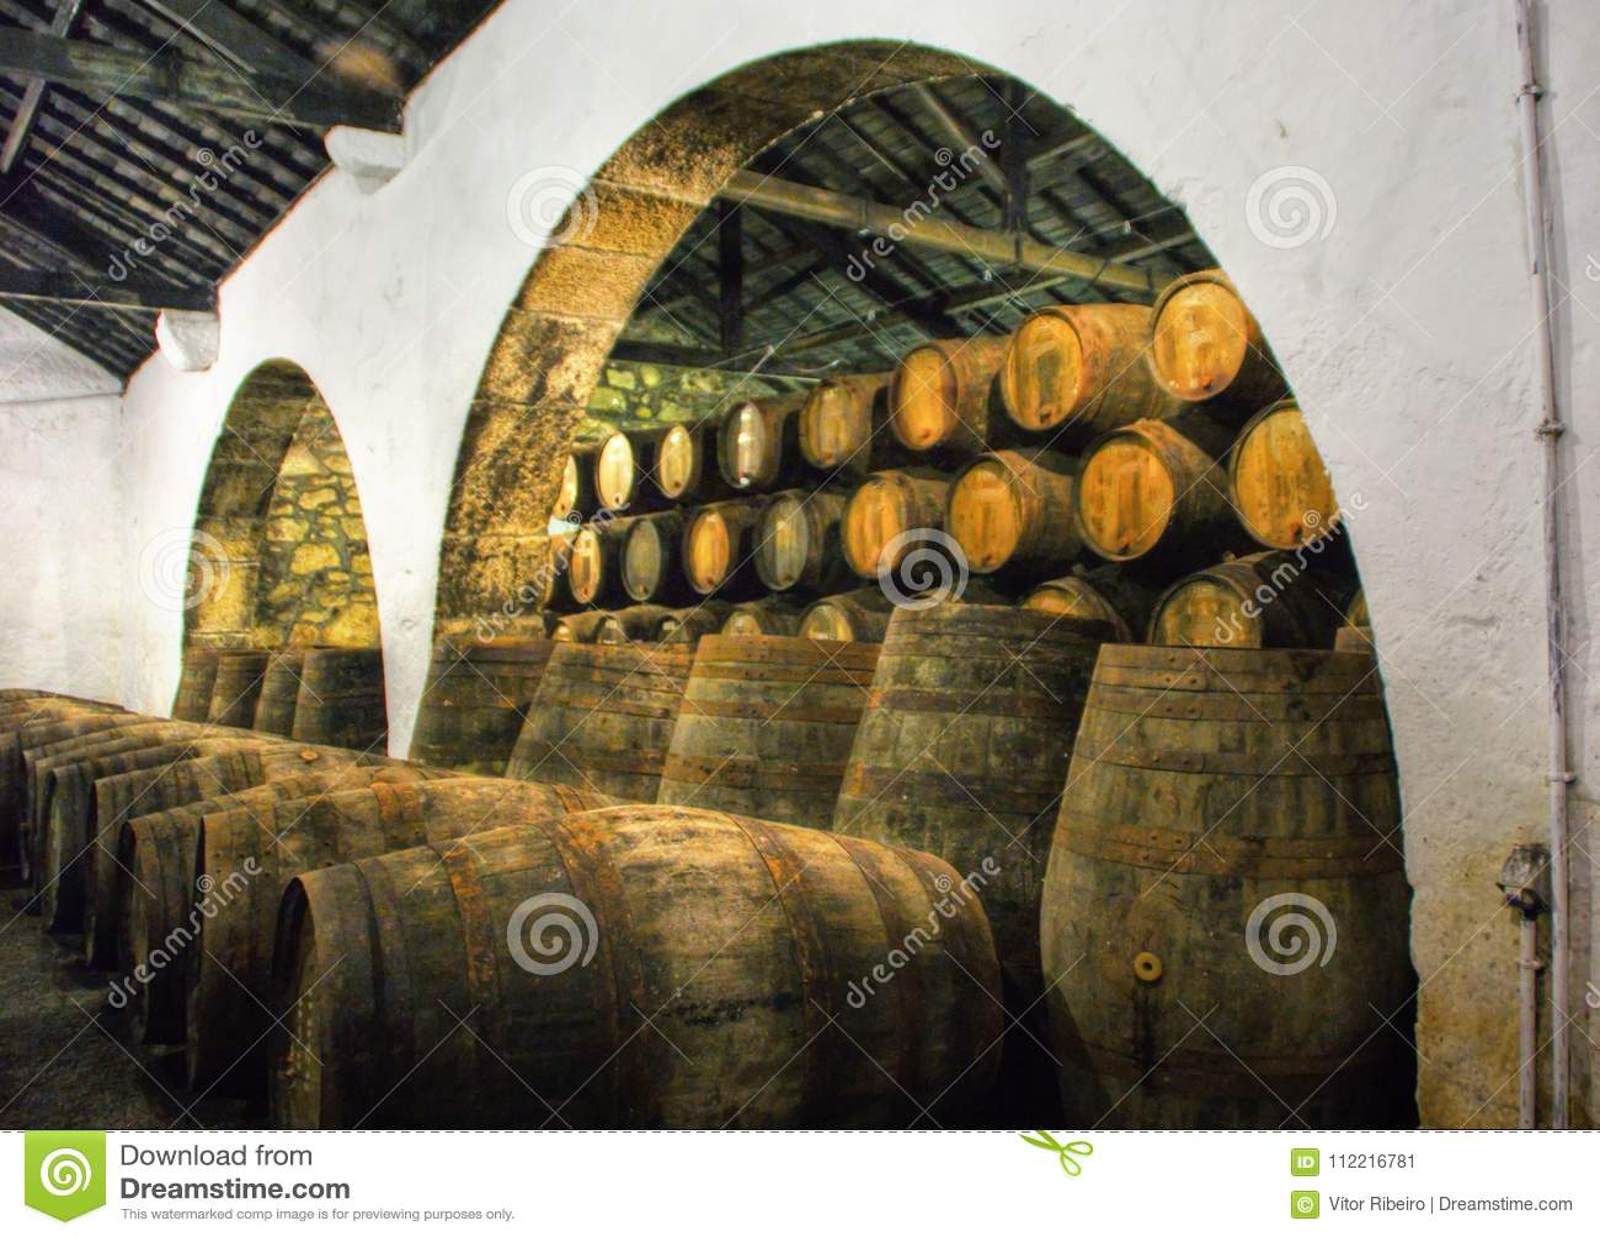 Port Wine Cellars in Vila Nova de Gaia